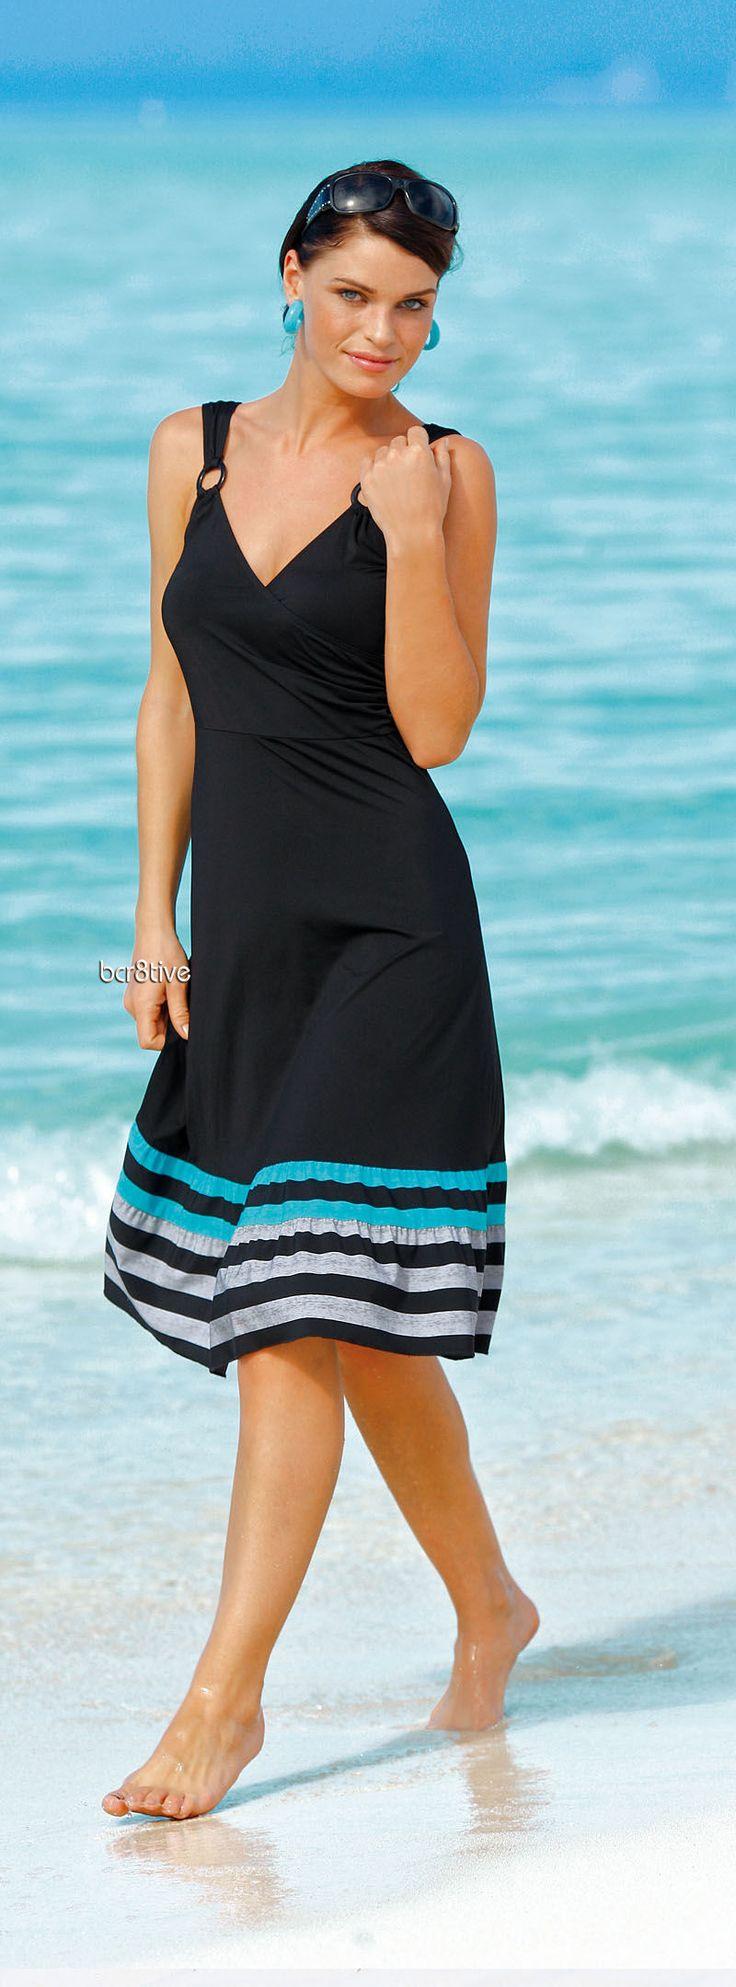 Sensuous fashions vero beach 91